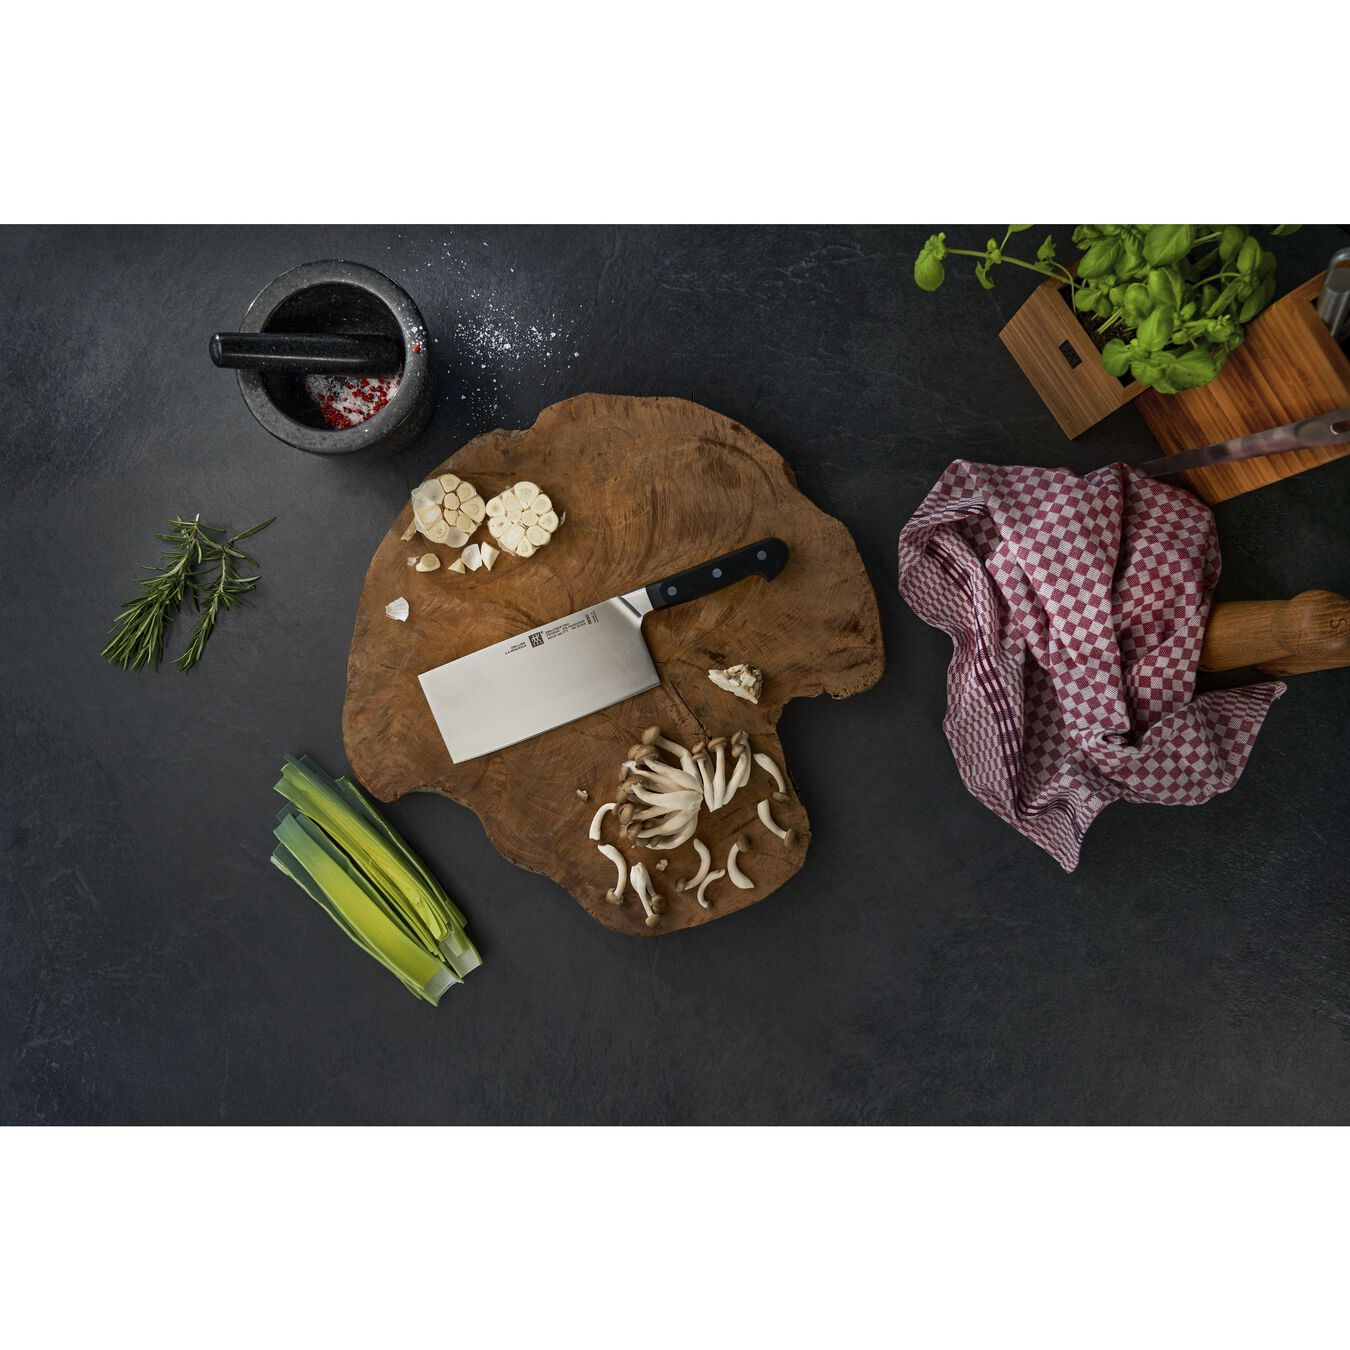 Chin. Kochmesser 18 cm, Kunststoff,,large 2